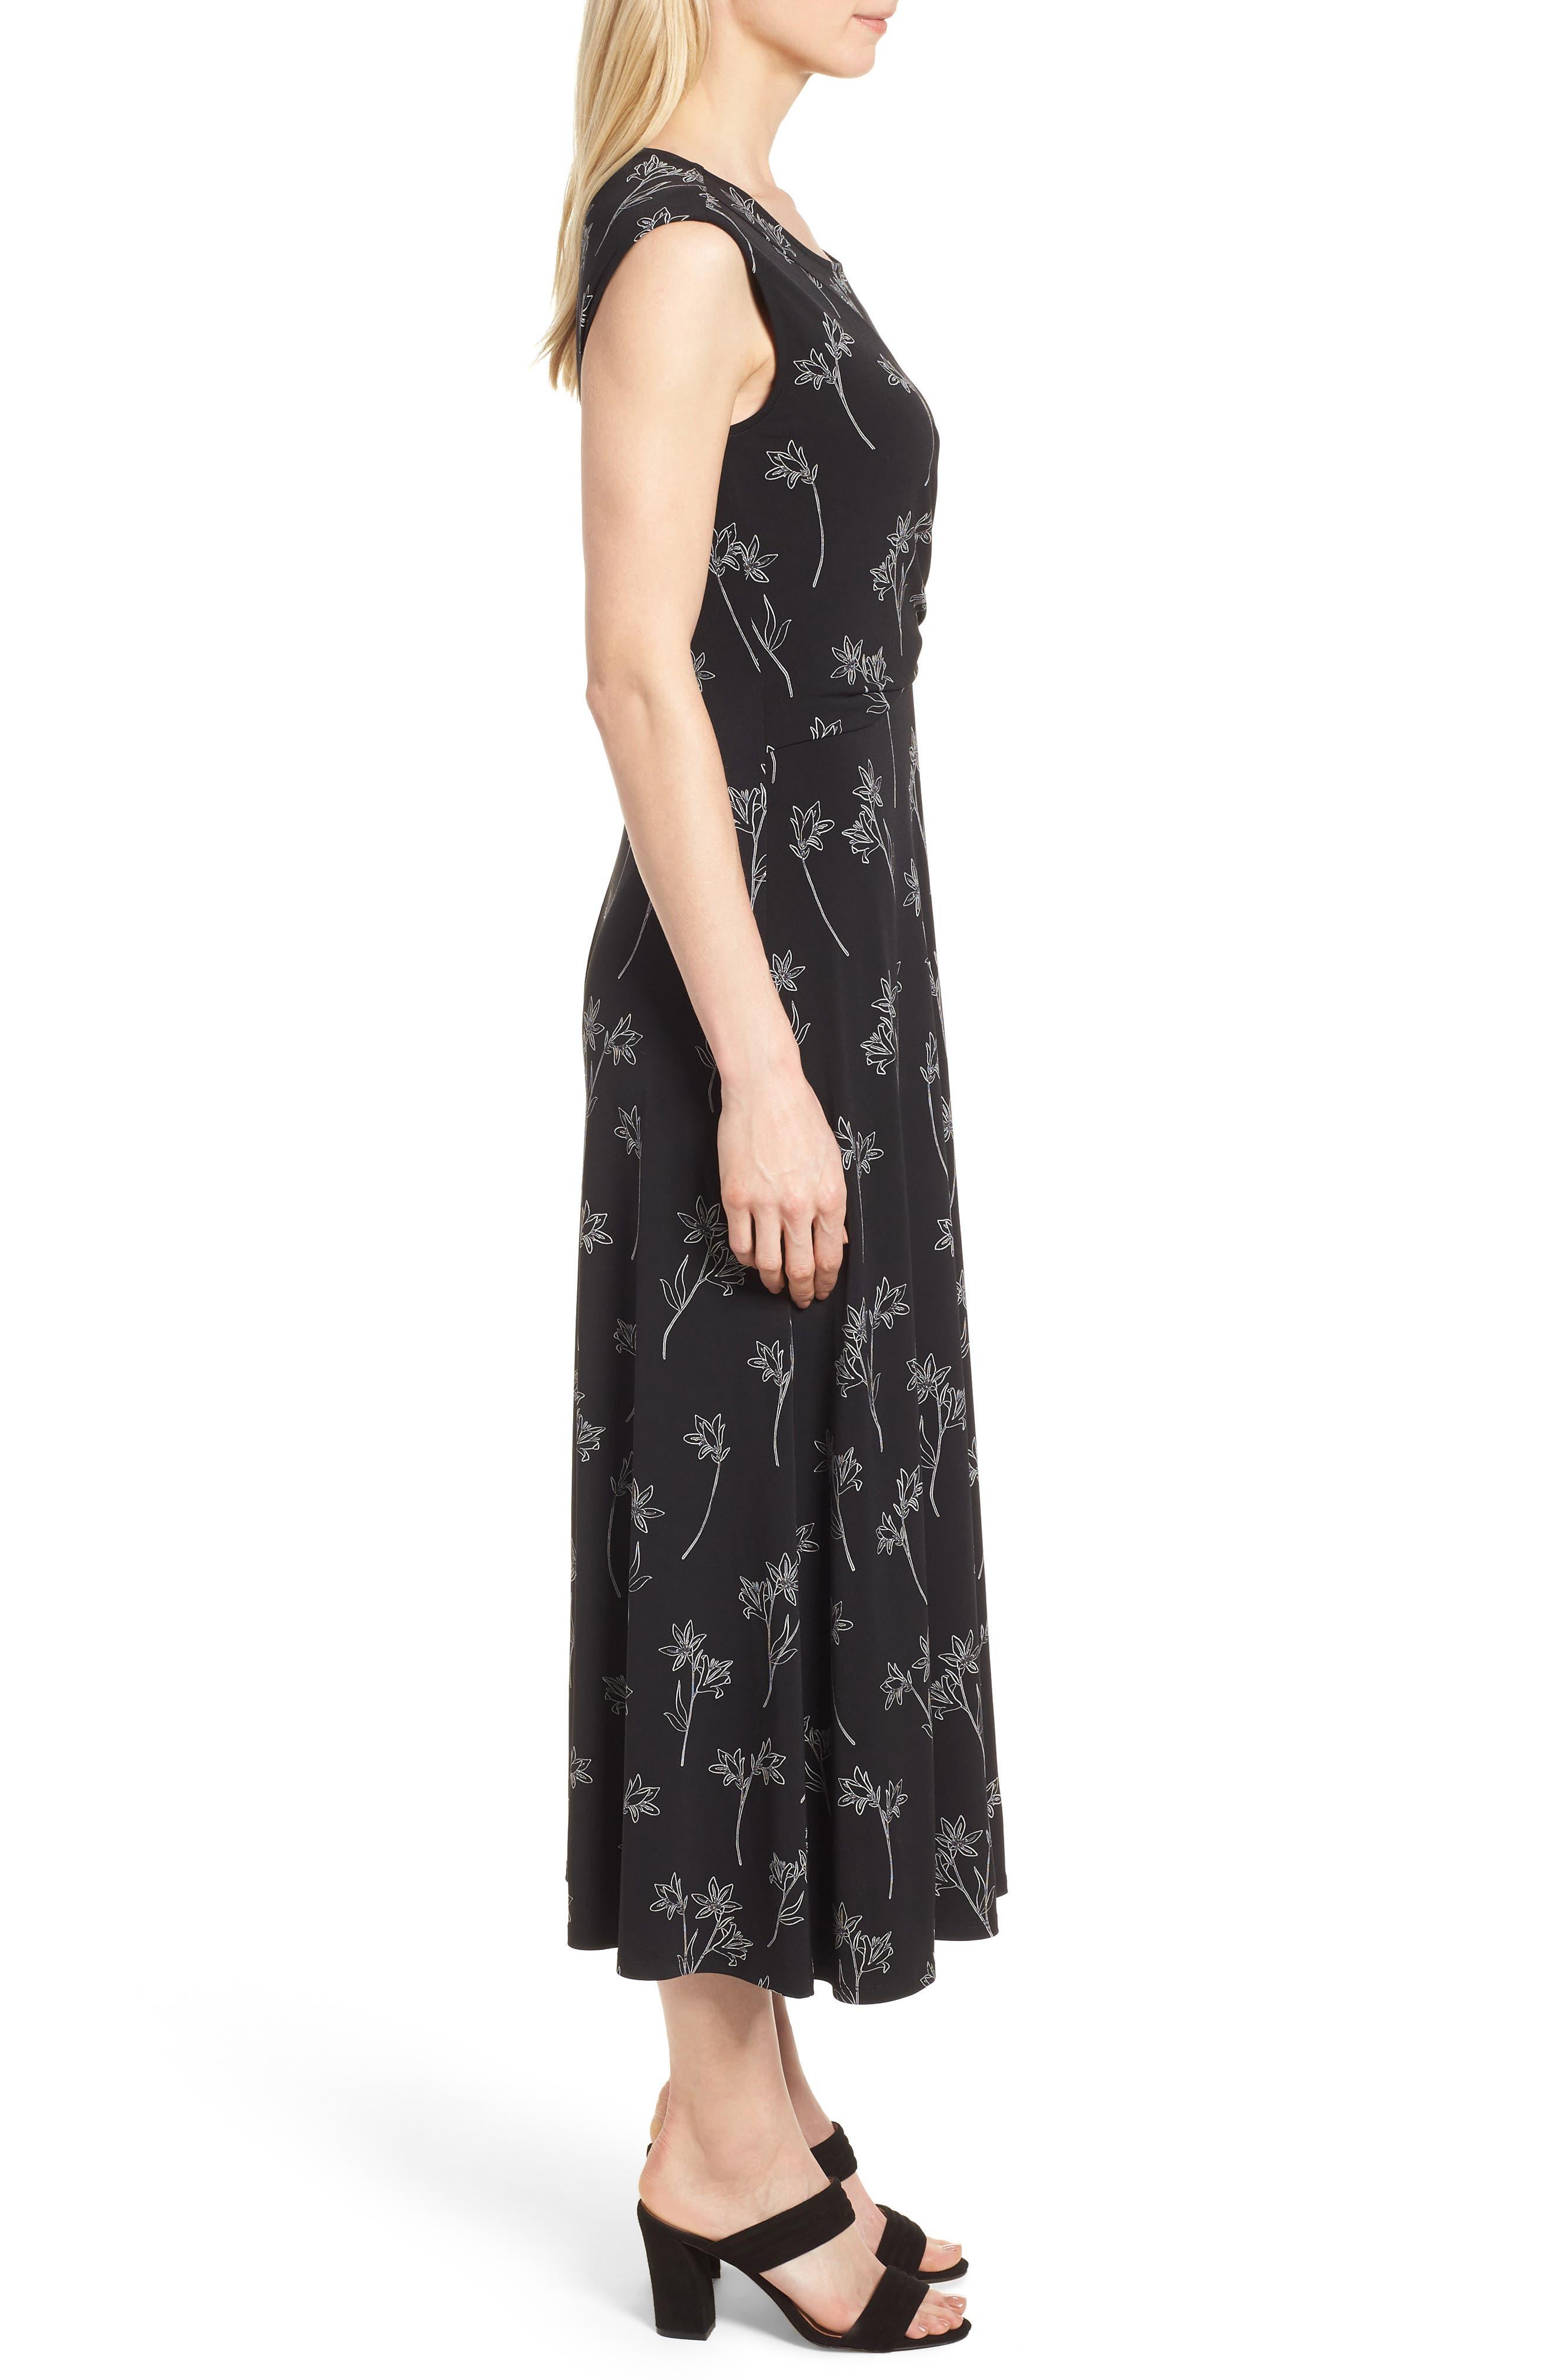 Floral Outlines Knot Front Maxi Dress,                             Alternate thumbnail 3, color,                             060-Rich Black